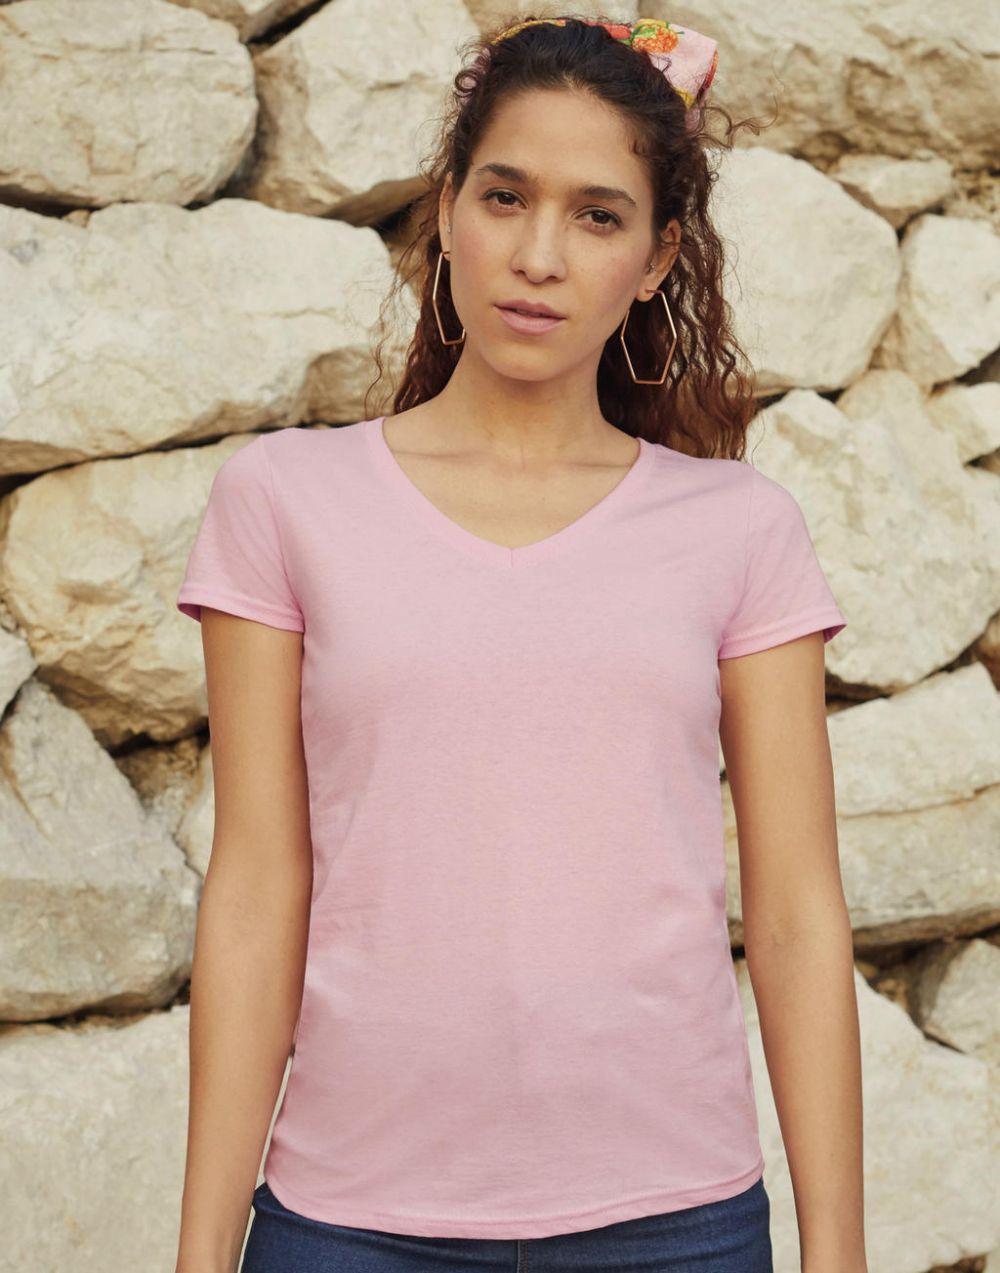 Camisetas manga corta fruit of the loom cuello v valueweight corte femenino con logo vista 1